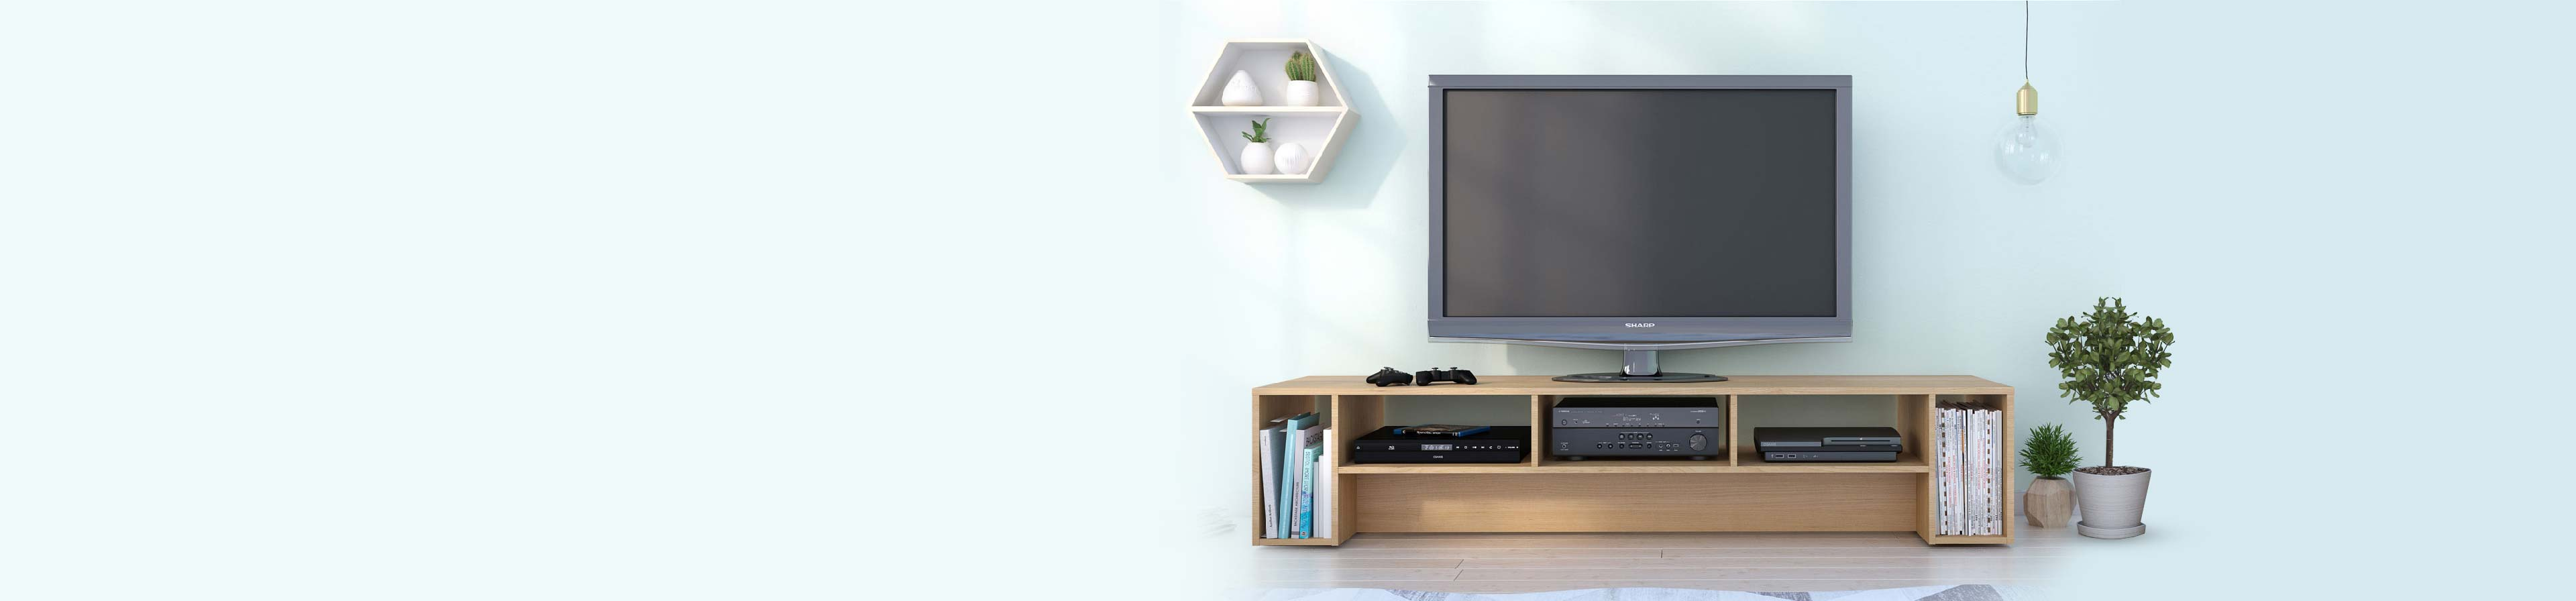 Glass Corner TV Stand Console with Storage AV Shelf Home Furniture Printer Stand